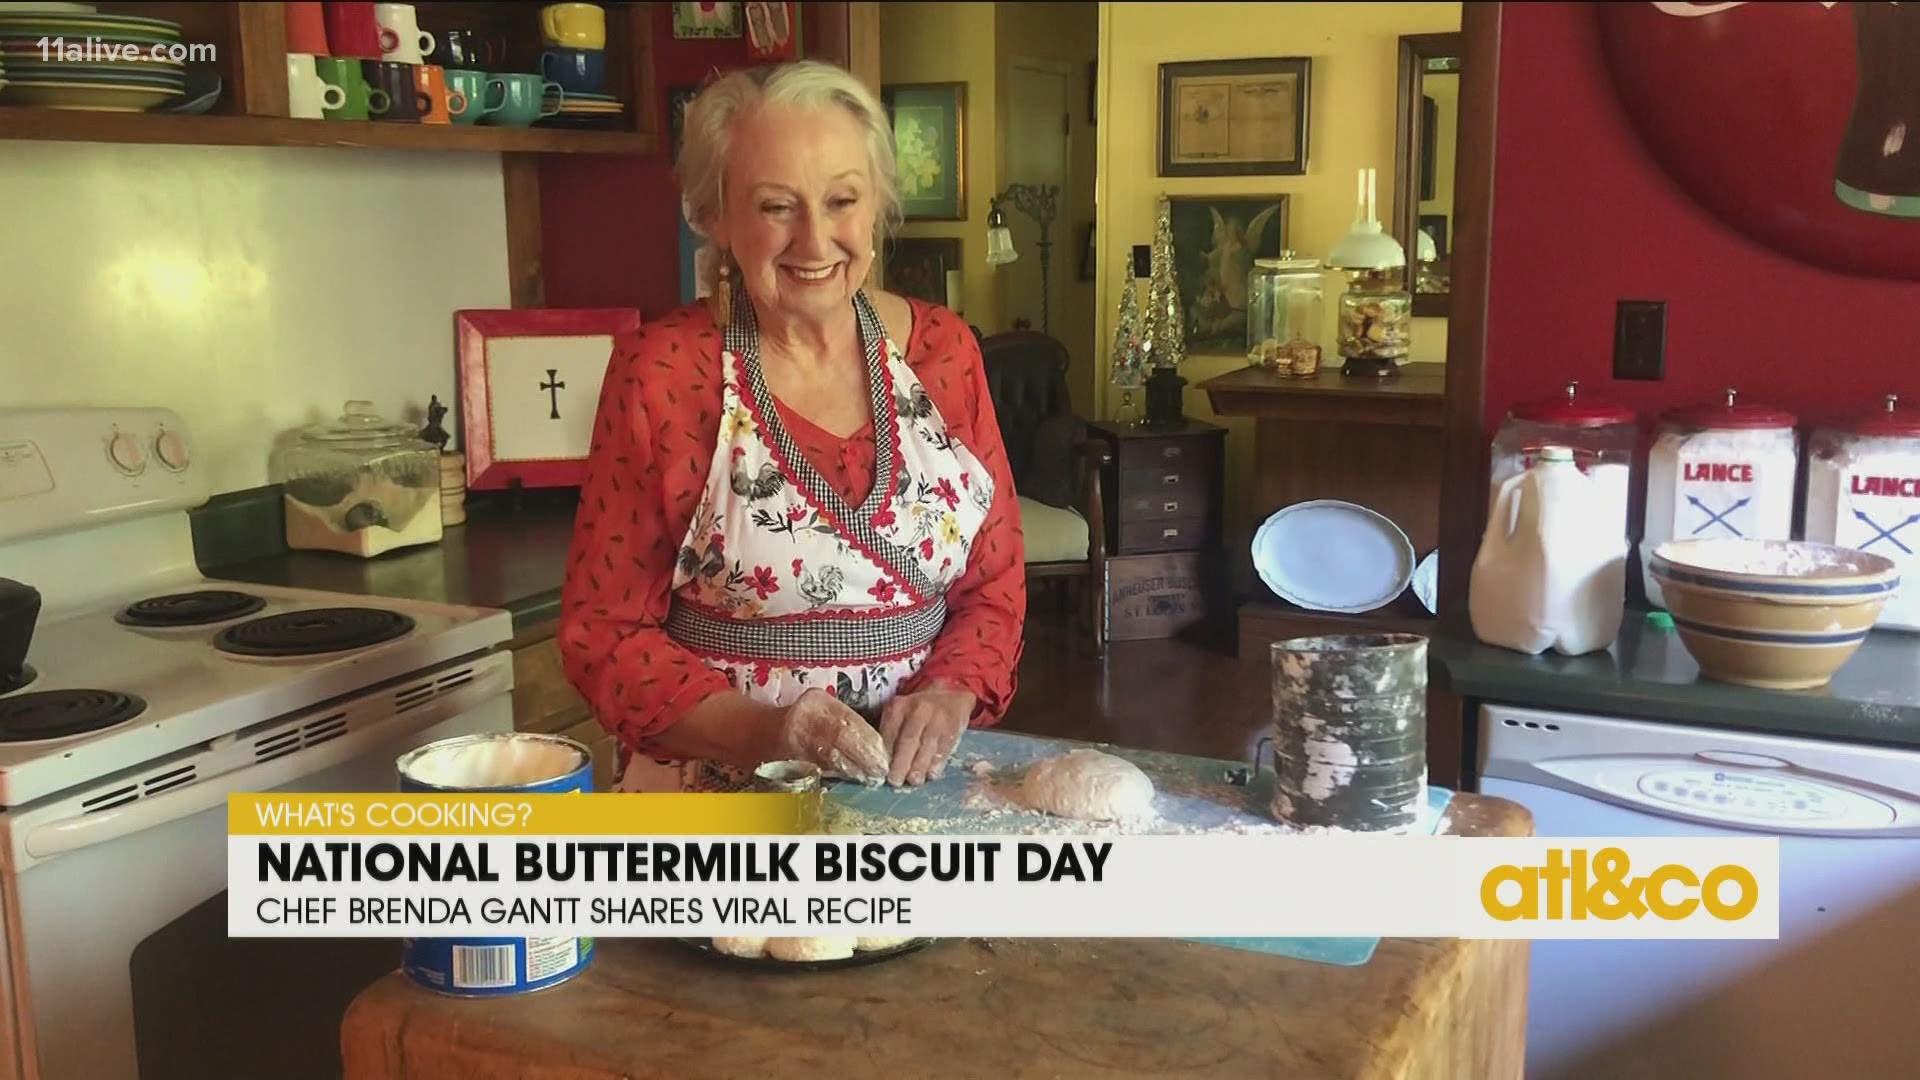 National Buttermilk Biscuit Day With Brenda Gantt 11alive Com